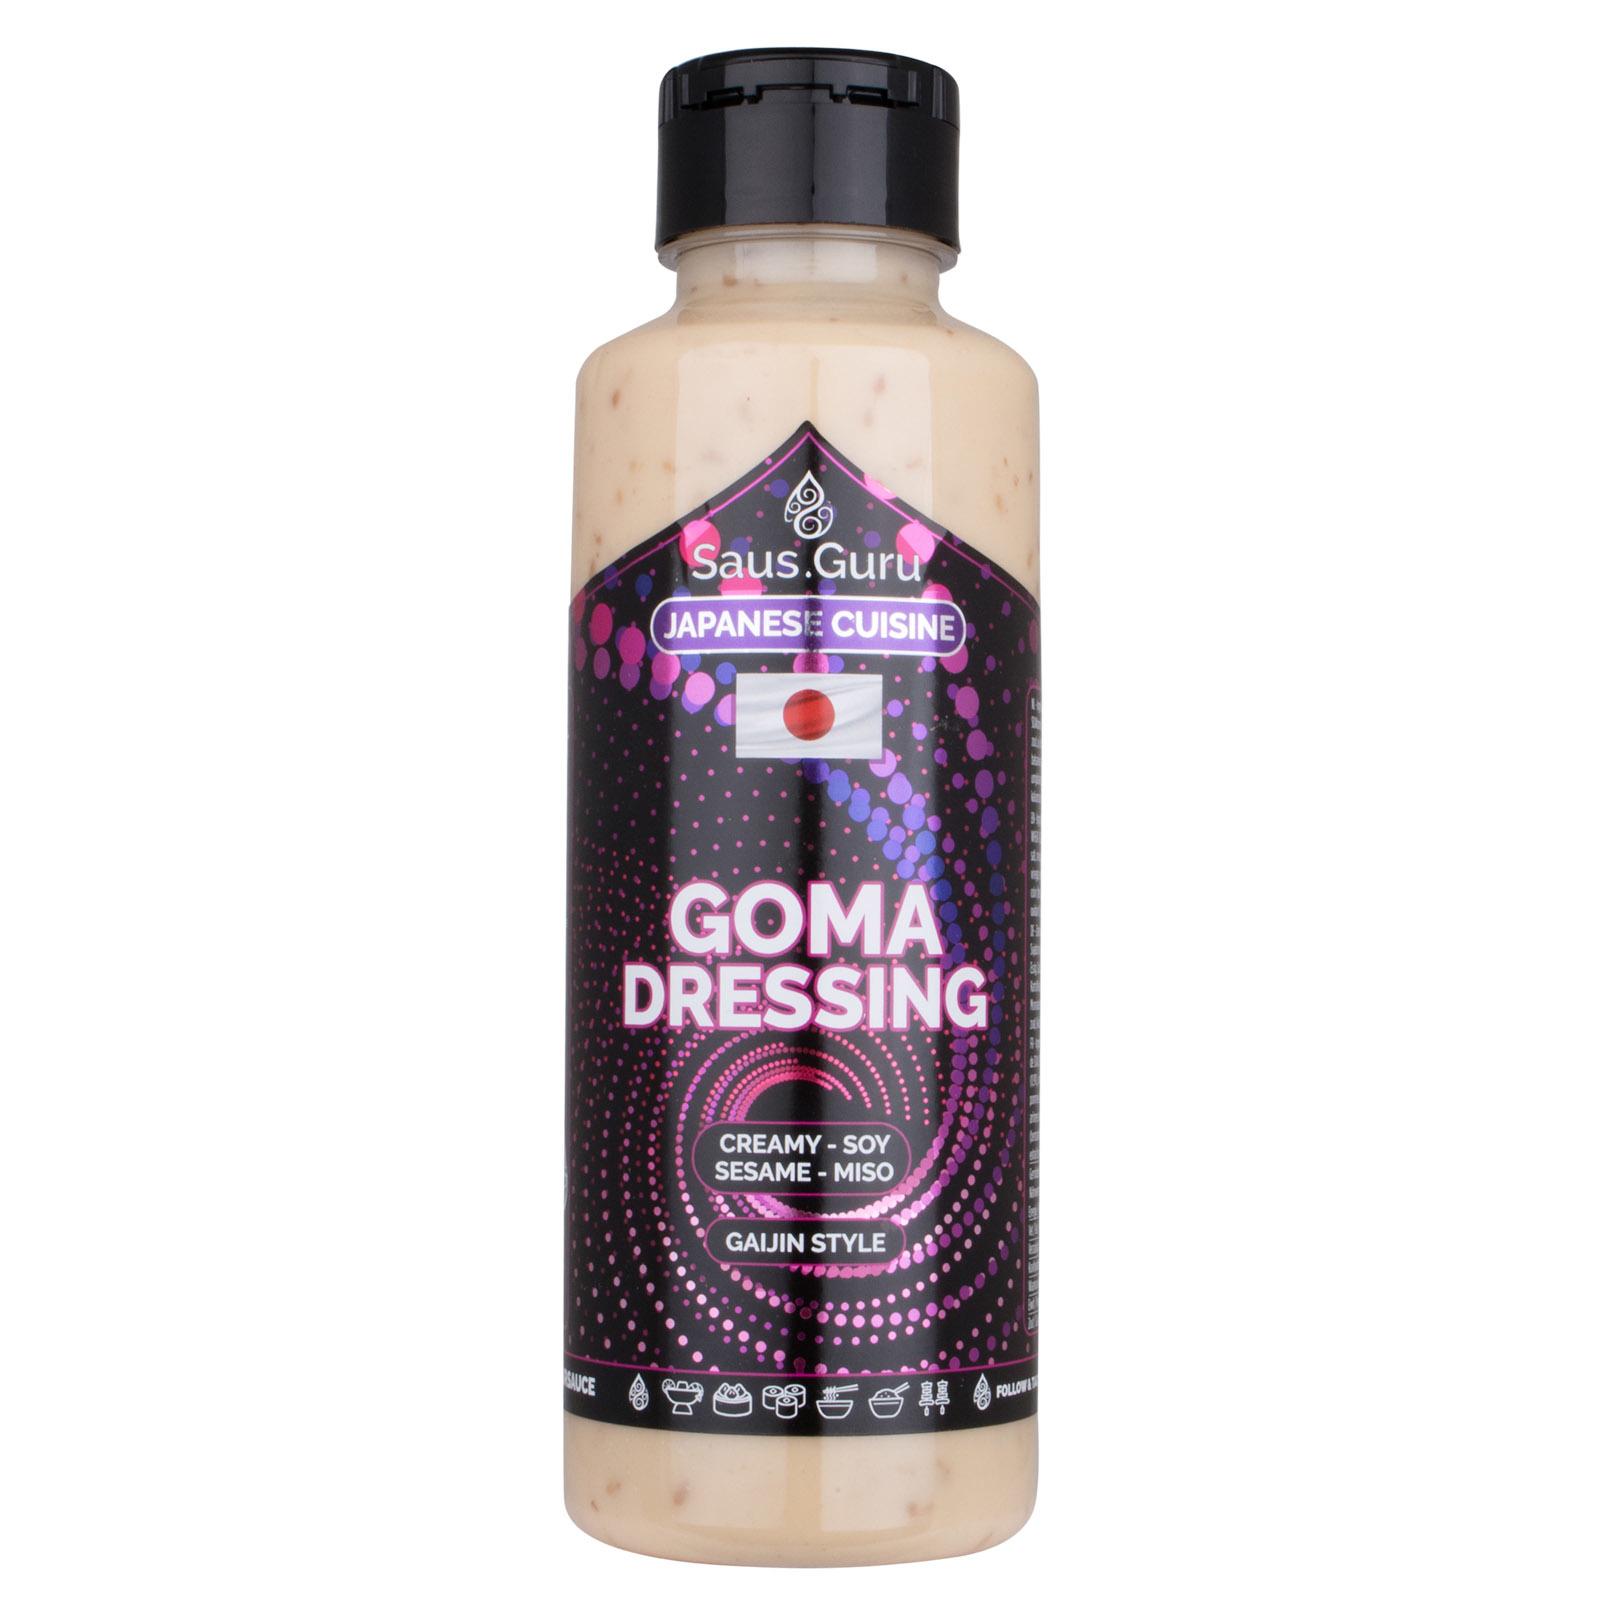 Saus.Guru's Goma Dressing-2